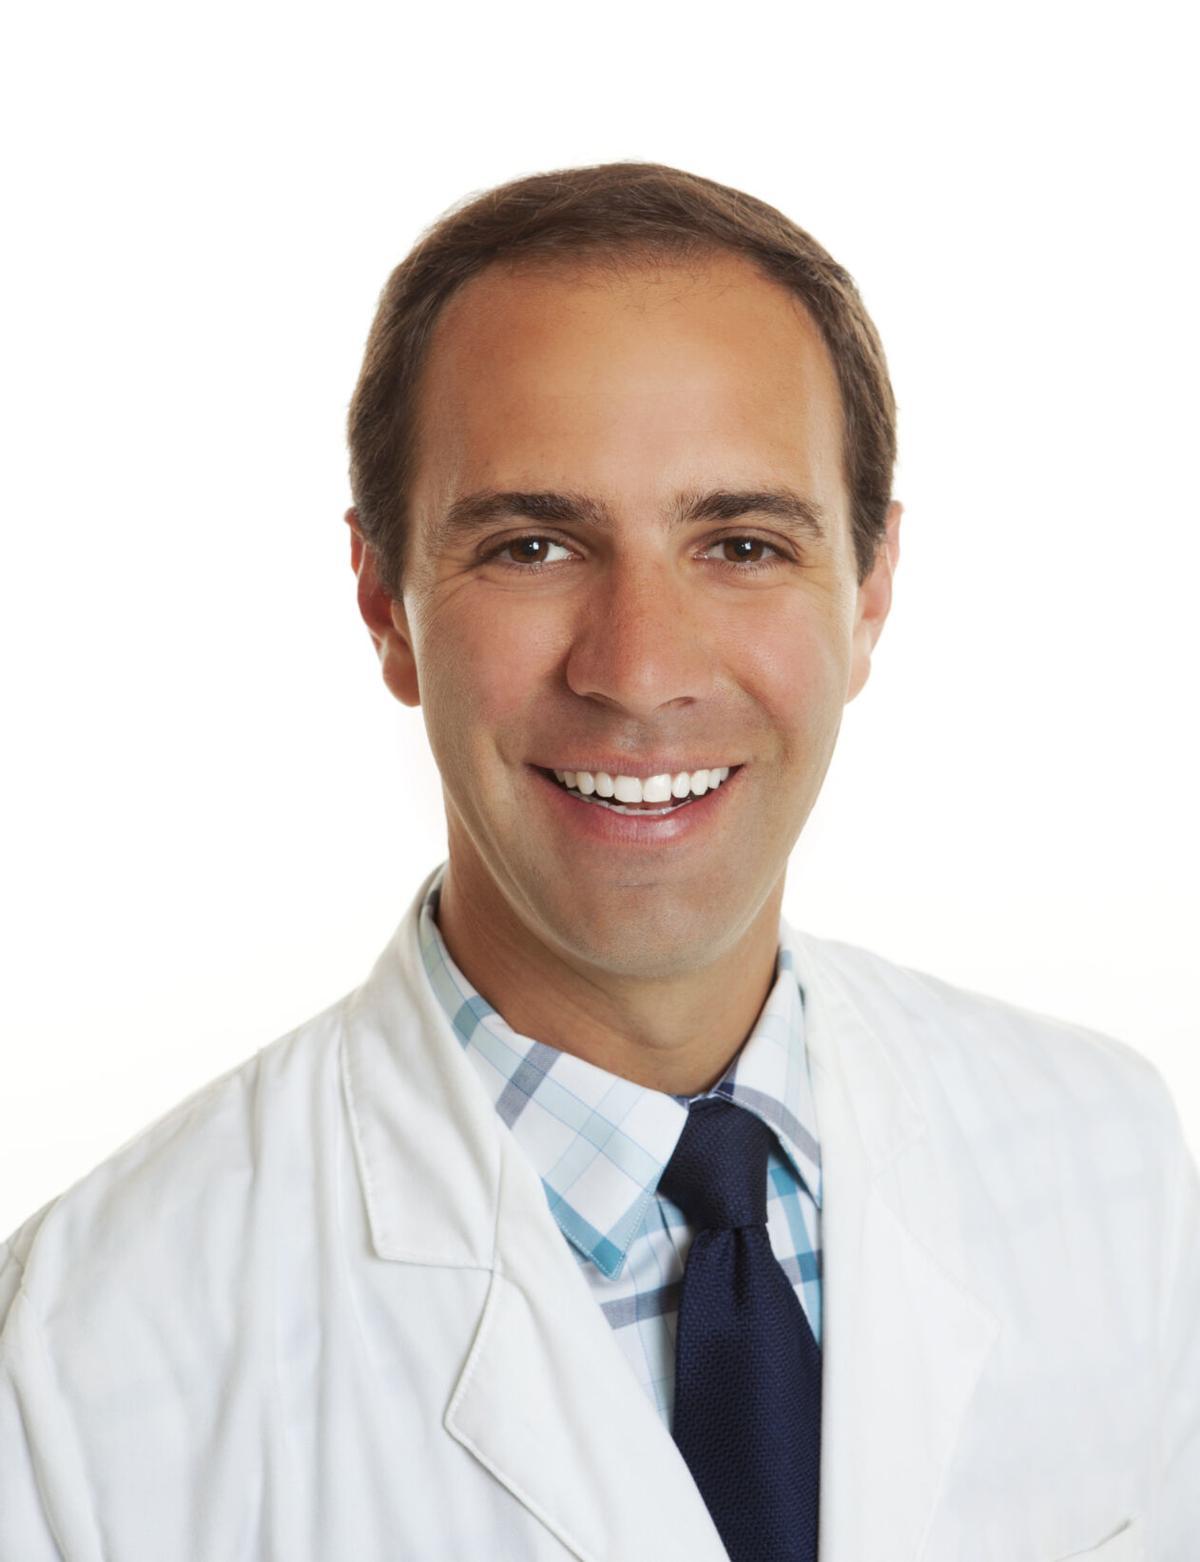 Evangelical doctors address Covid-19, vaccines for Mifflinburg community